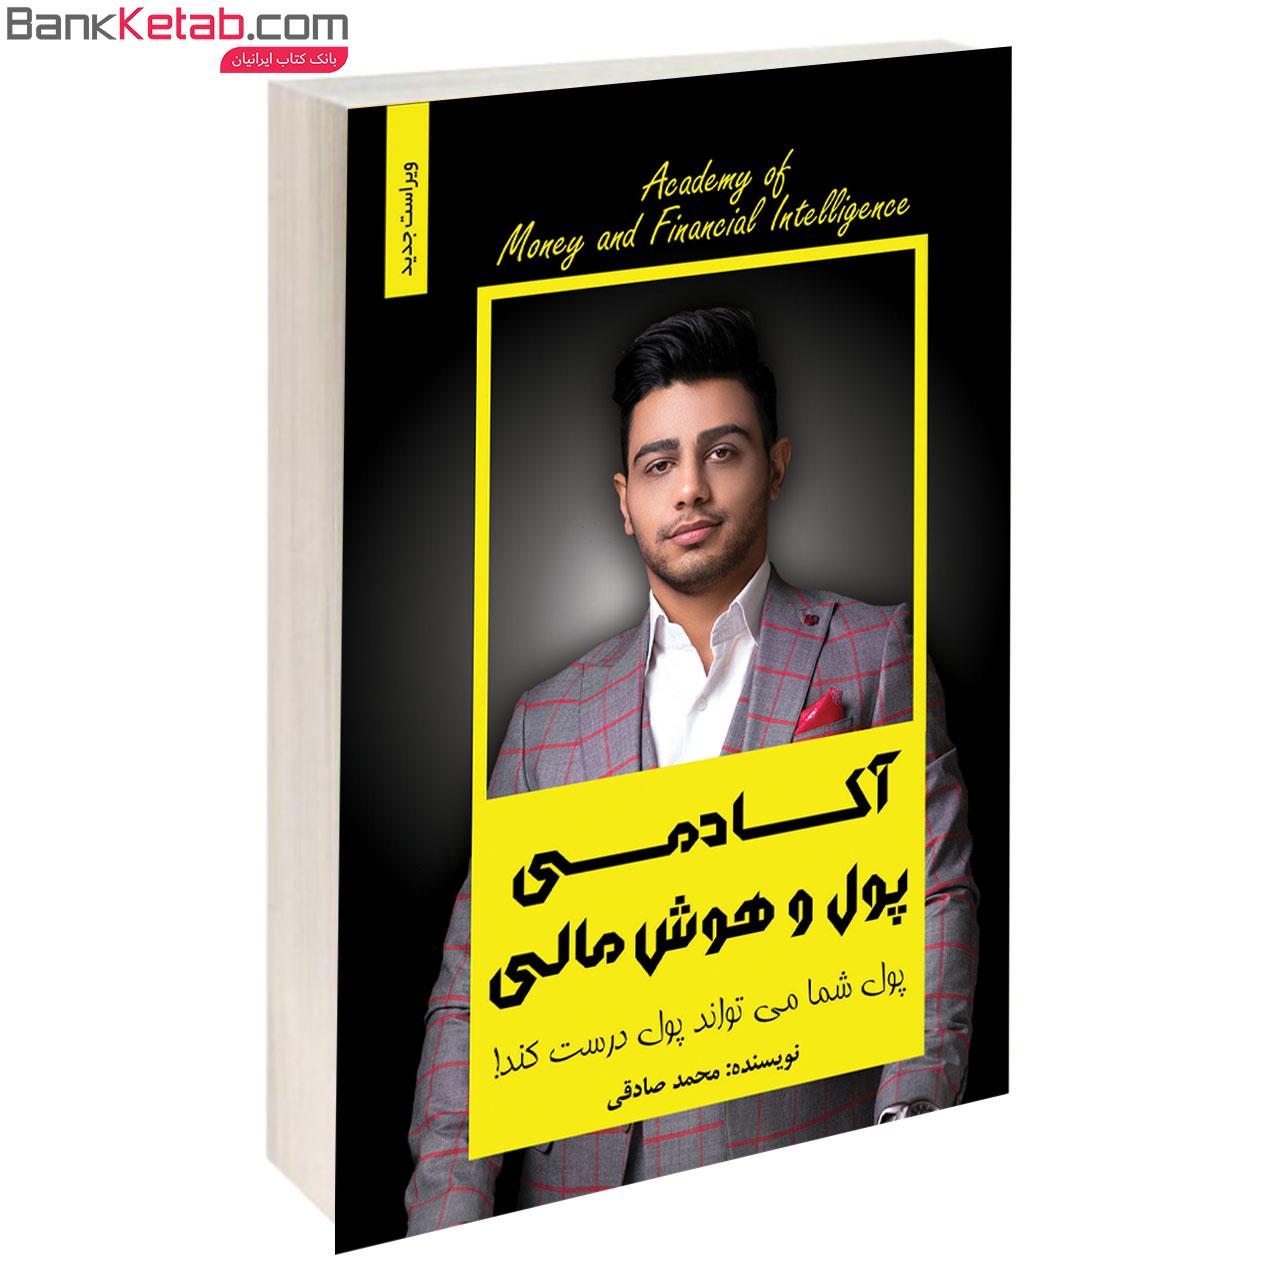 کتاب آکادمی پول و هوش مالی اثر محمد صادقی